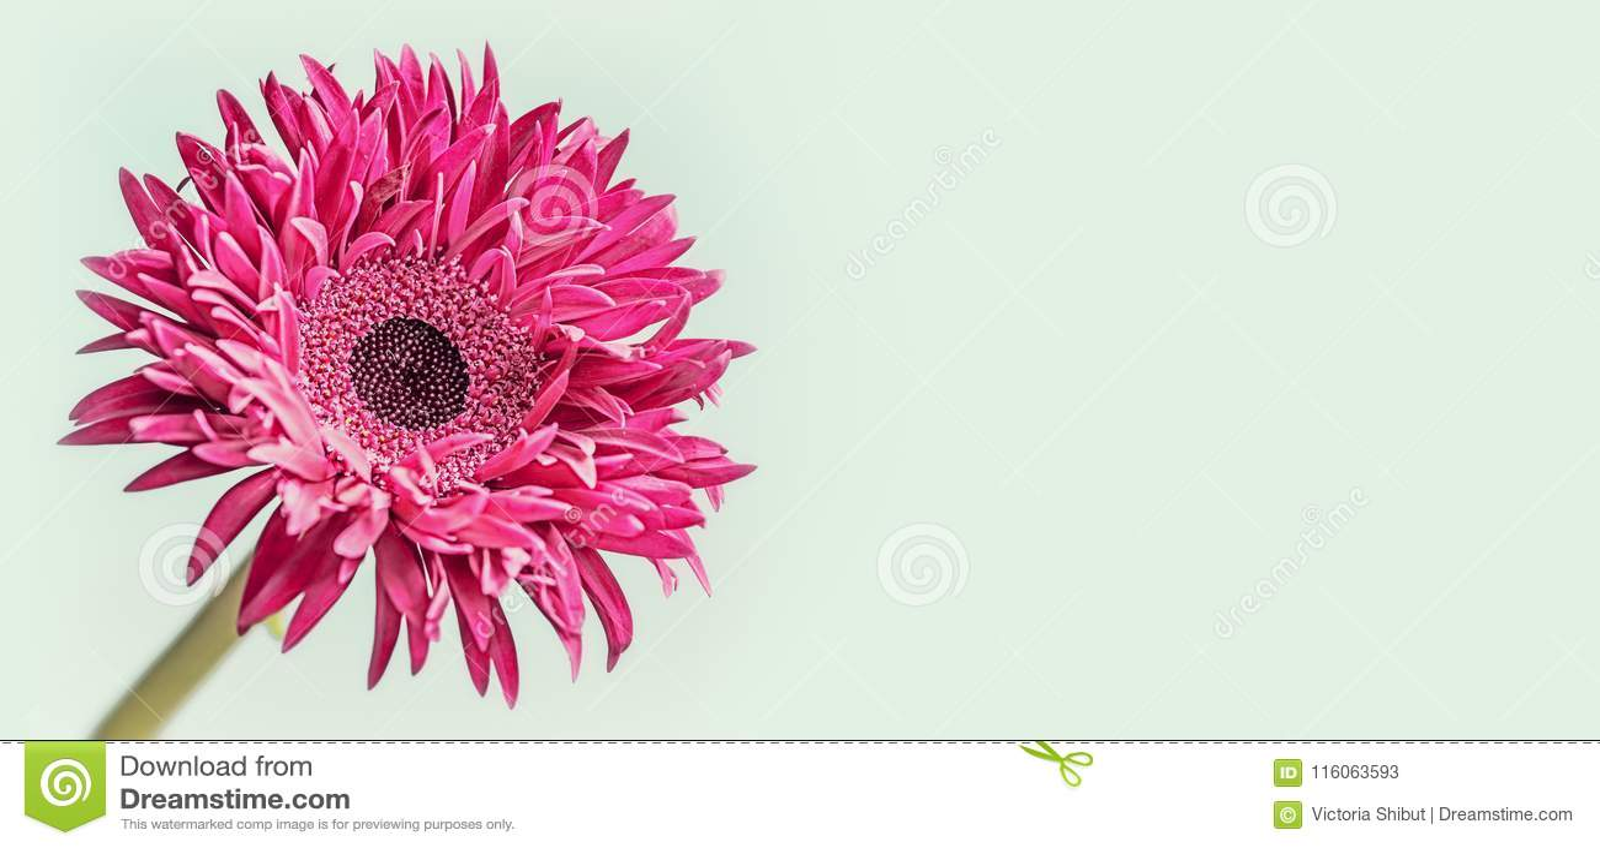 Floral υπόβαθρο εμβλημάτων με στενό επάνω του ρόδινου λουλουδιού